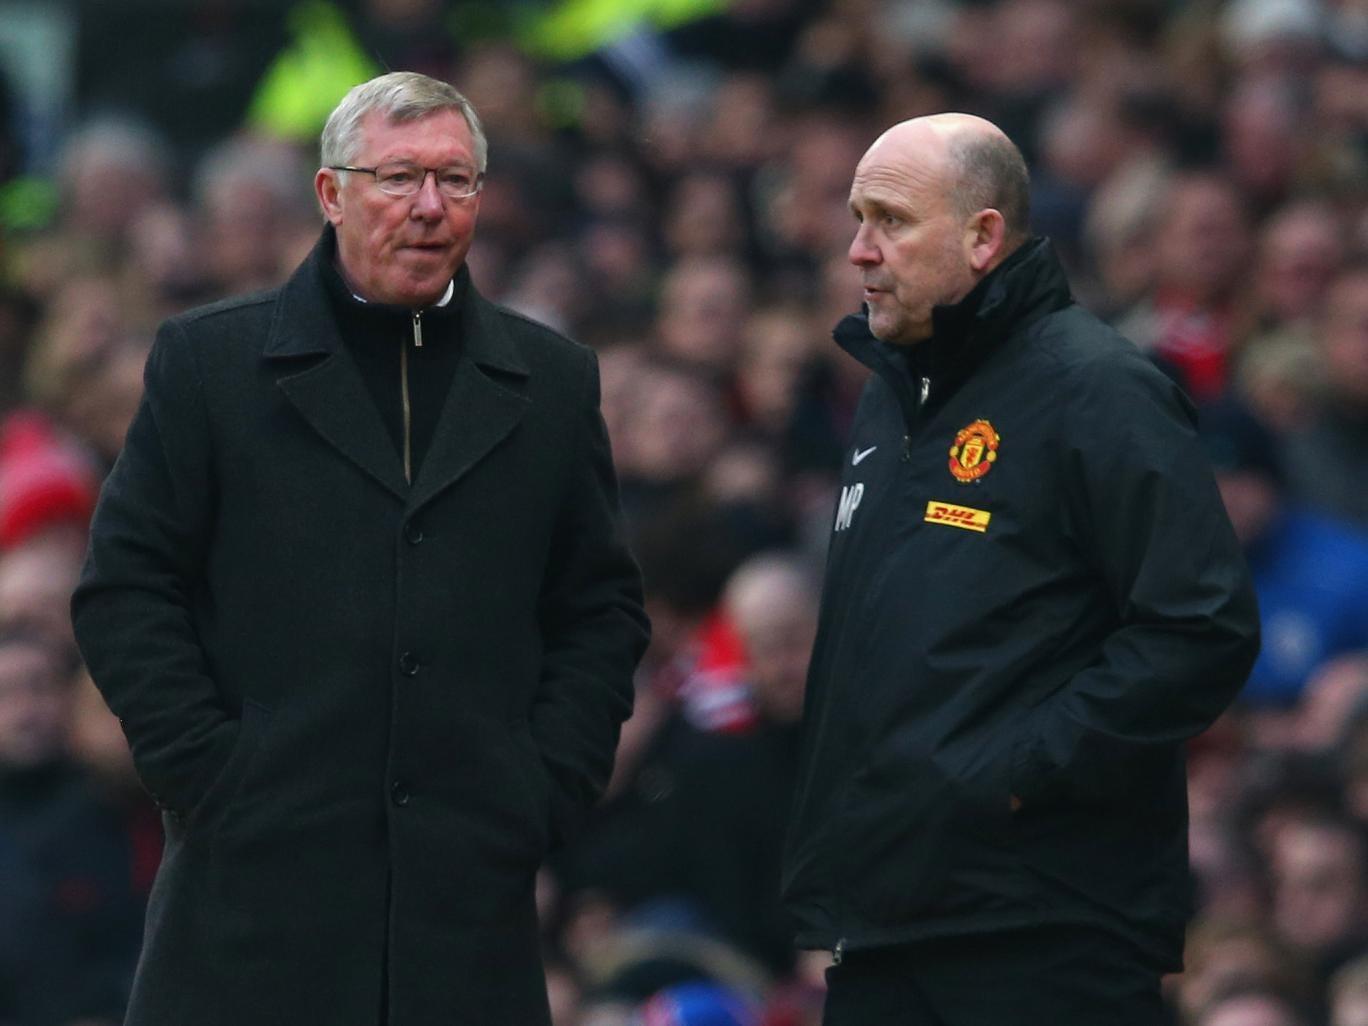 Mike Phelan alongside Sir Alex Ferguson